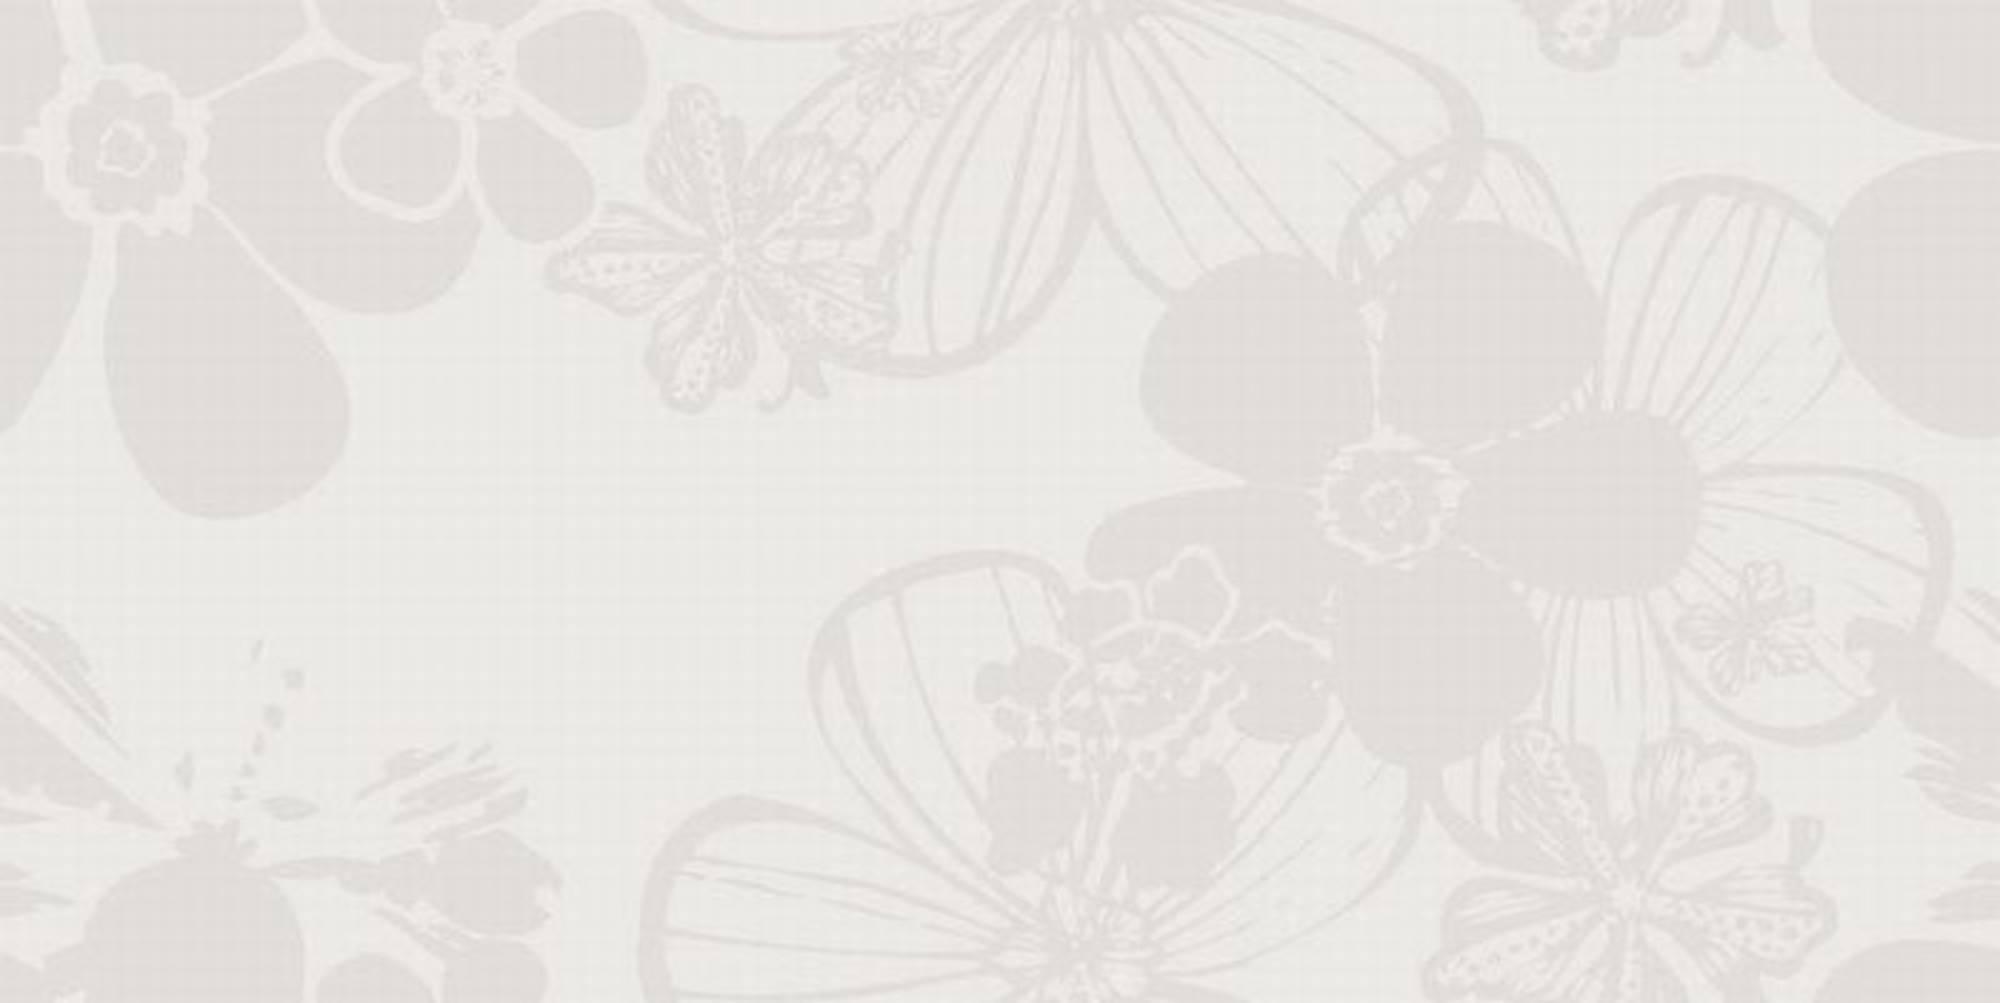 VILLEROY & BOCH MELROSE tegel 30x60 cm. decor flower WIT (1581NW15)